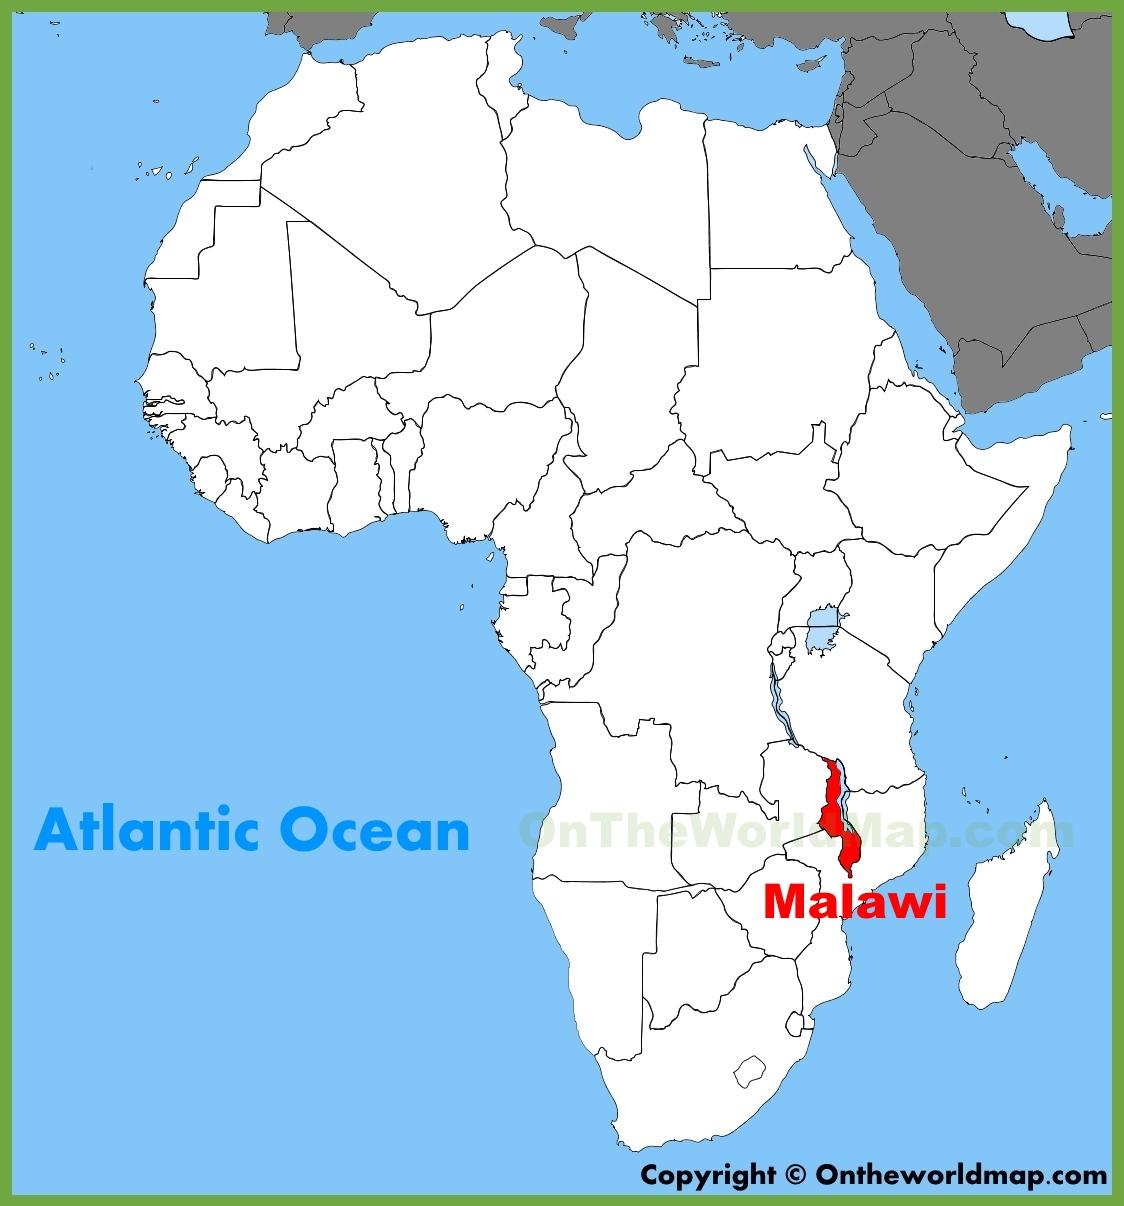 Malawi Africa Map Malawi location on the Africa map Malawi Africa Map